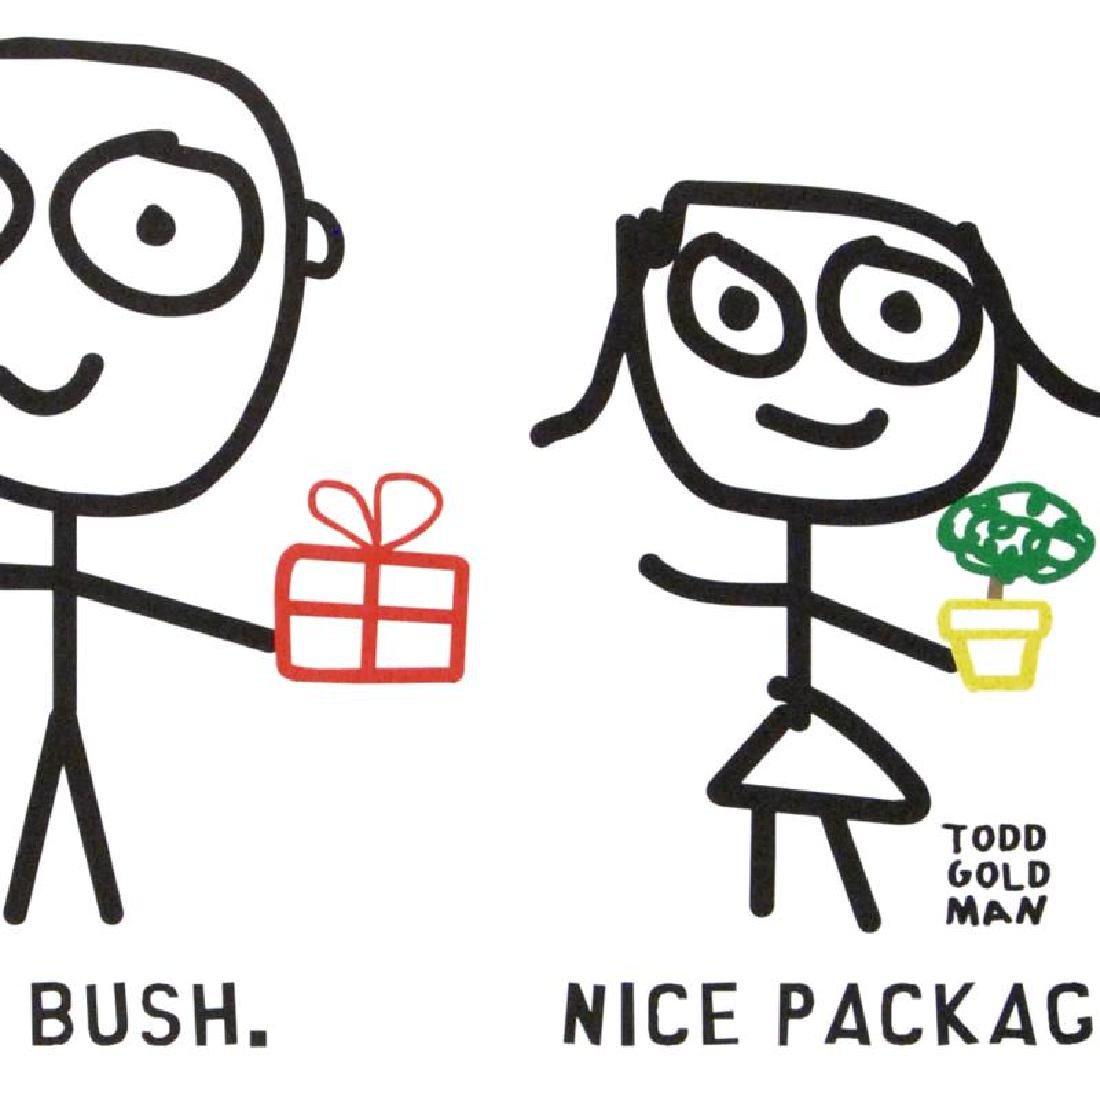 """Nice Package. Nice Bush."" Fine Art Litho Poster (36"" x - 2"